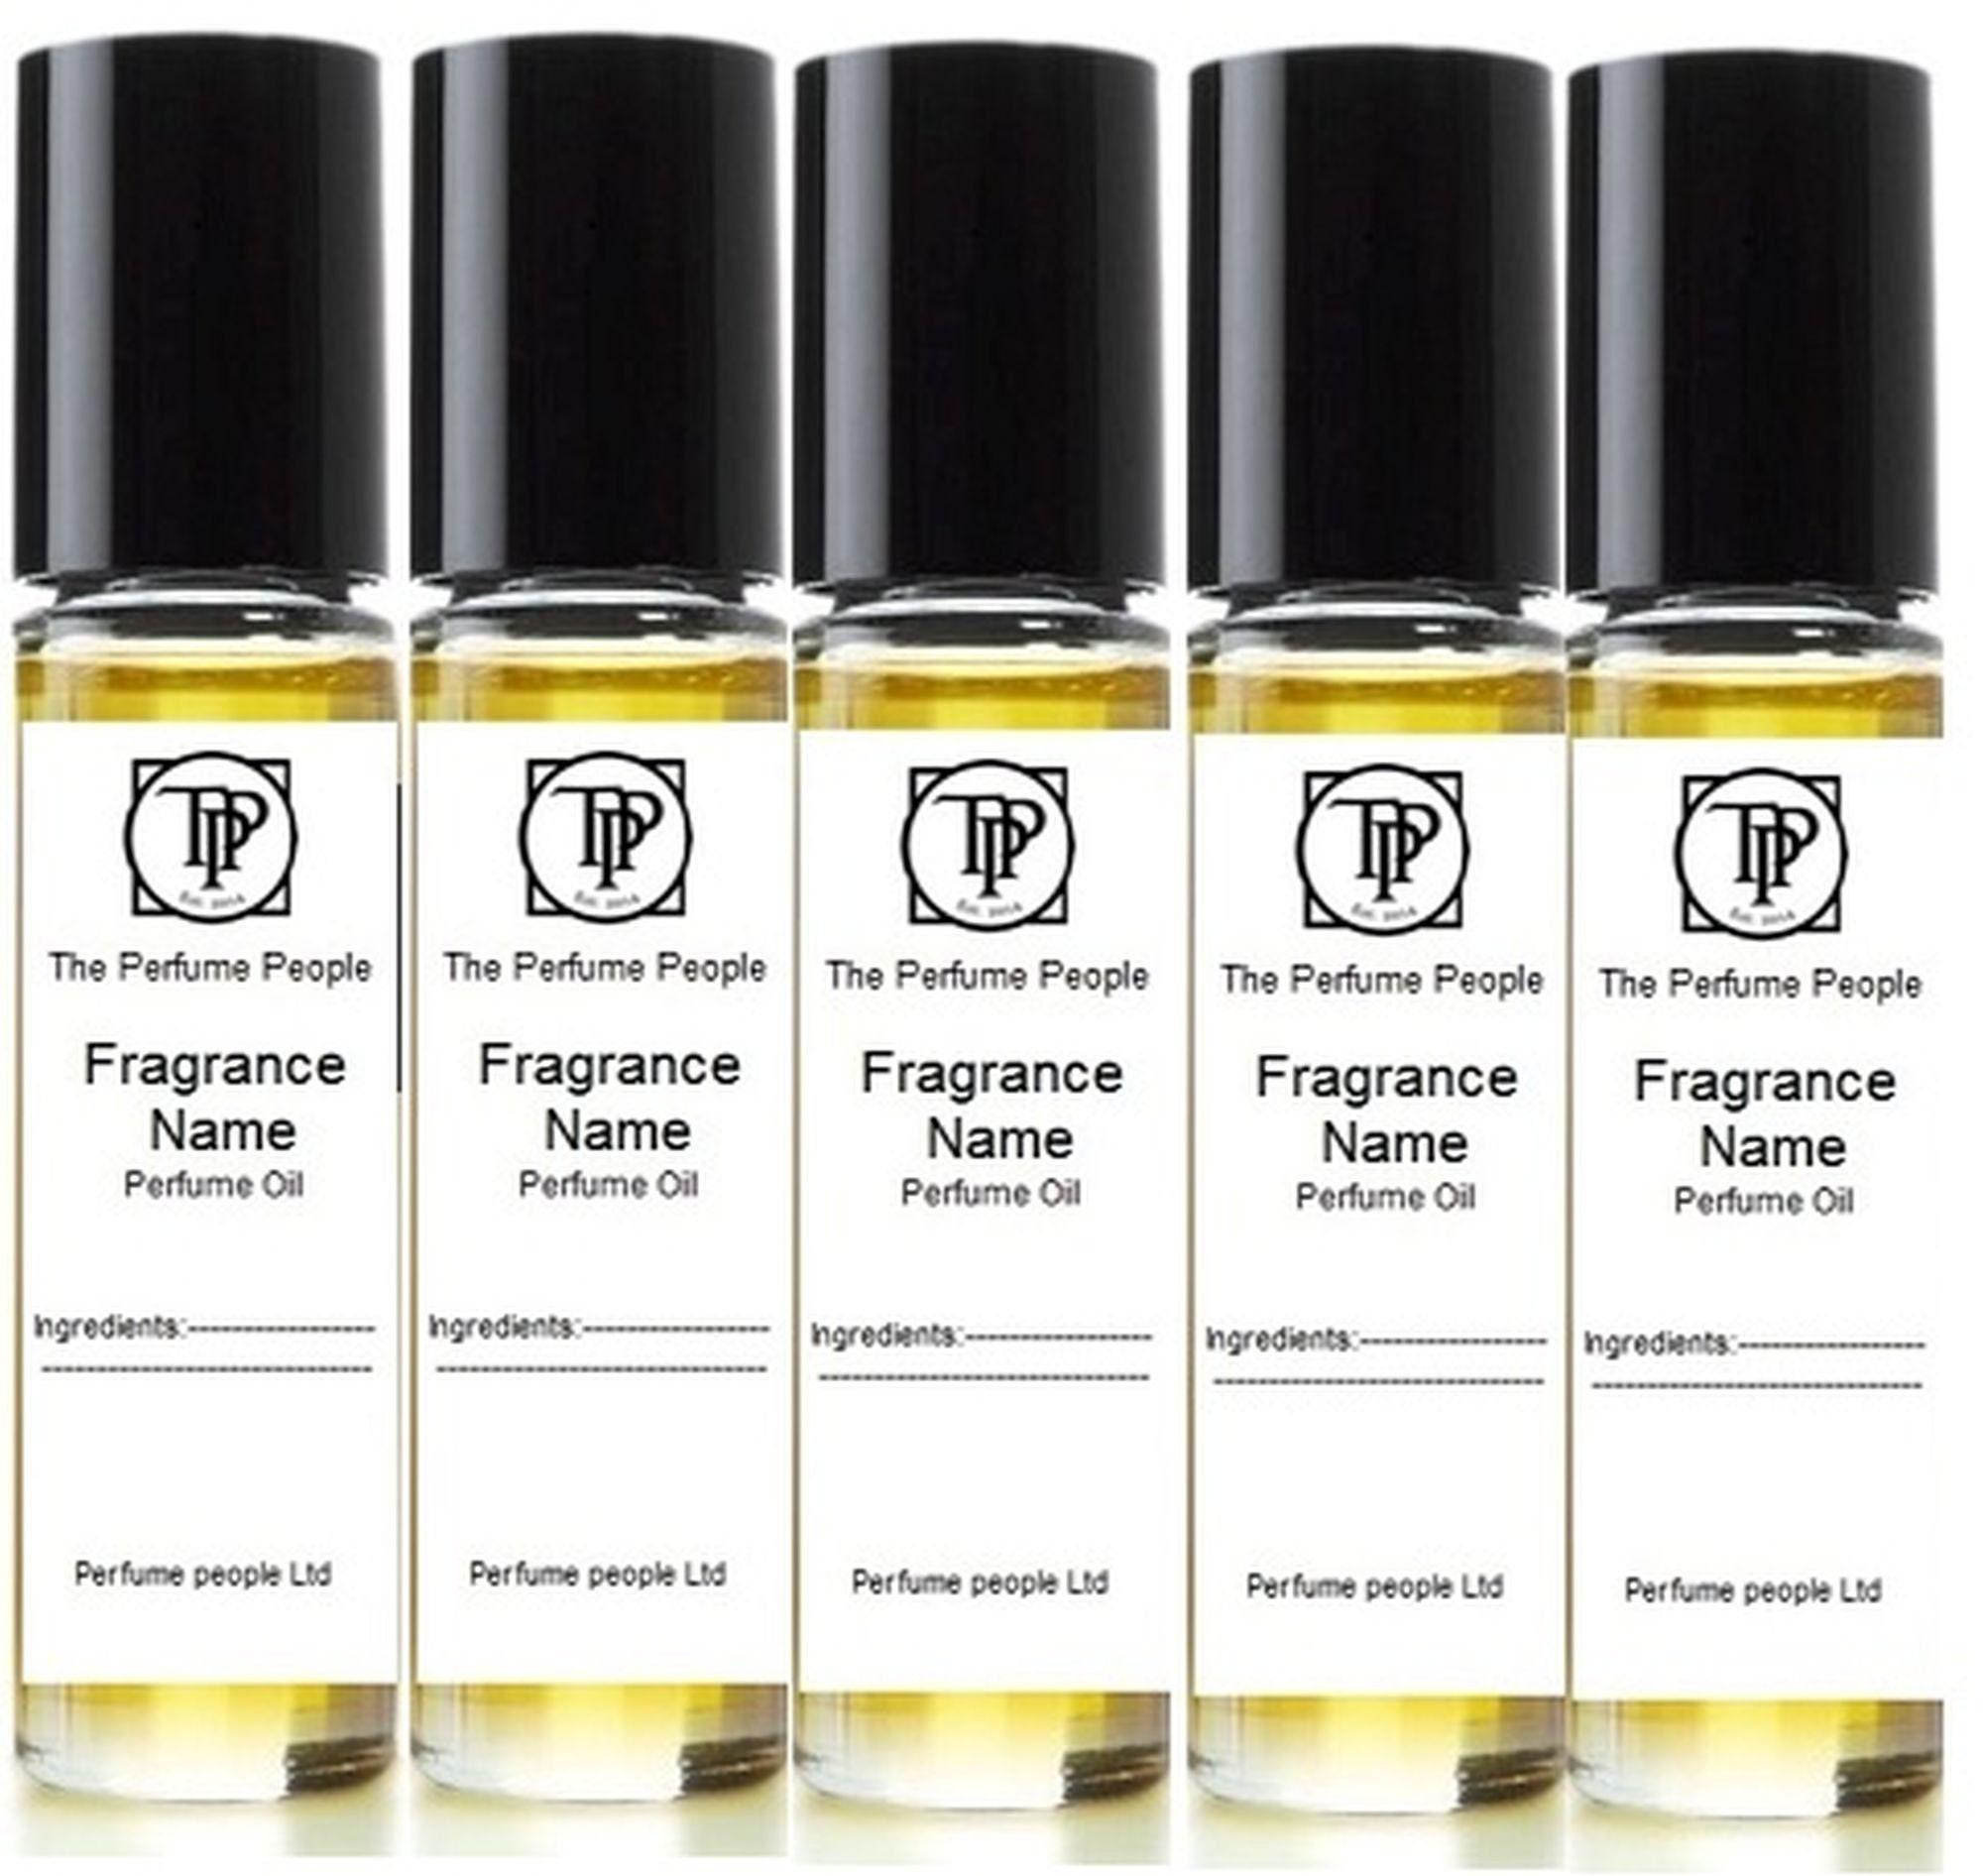 Antus Man  Huile de parfum  Gp 8  The Perfume People